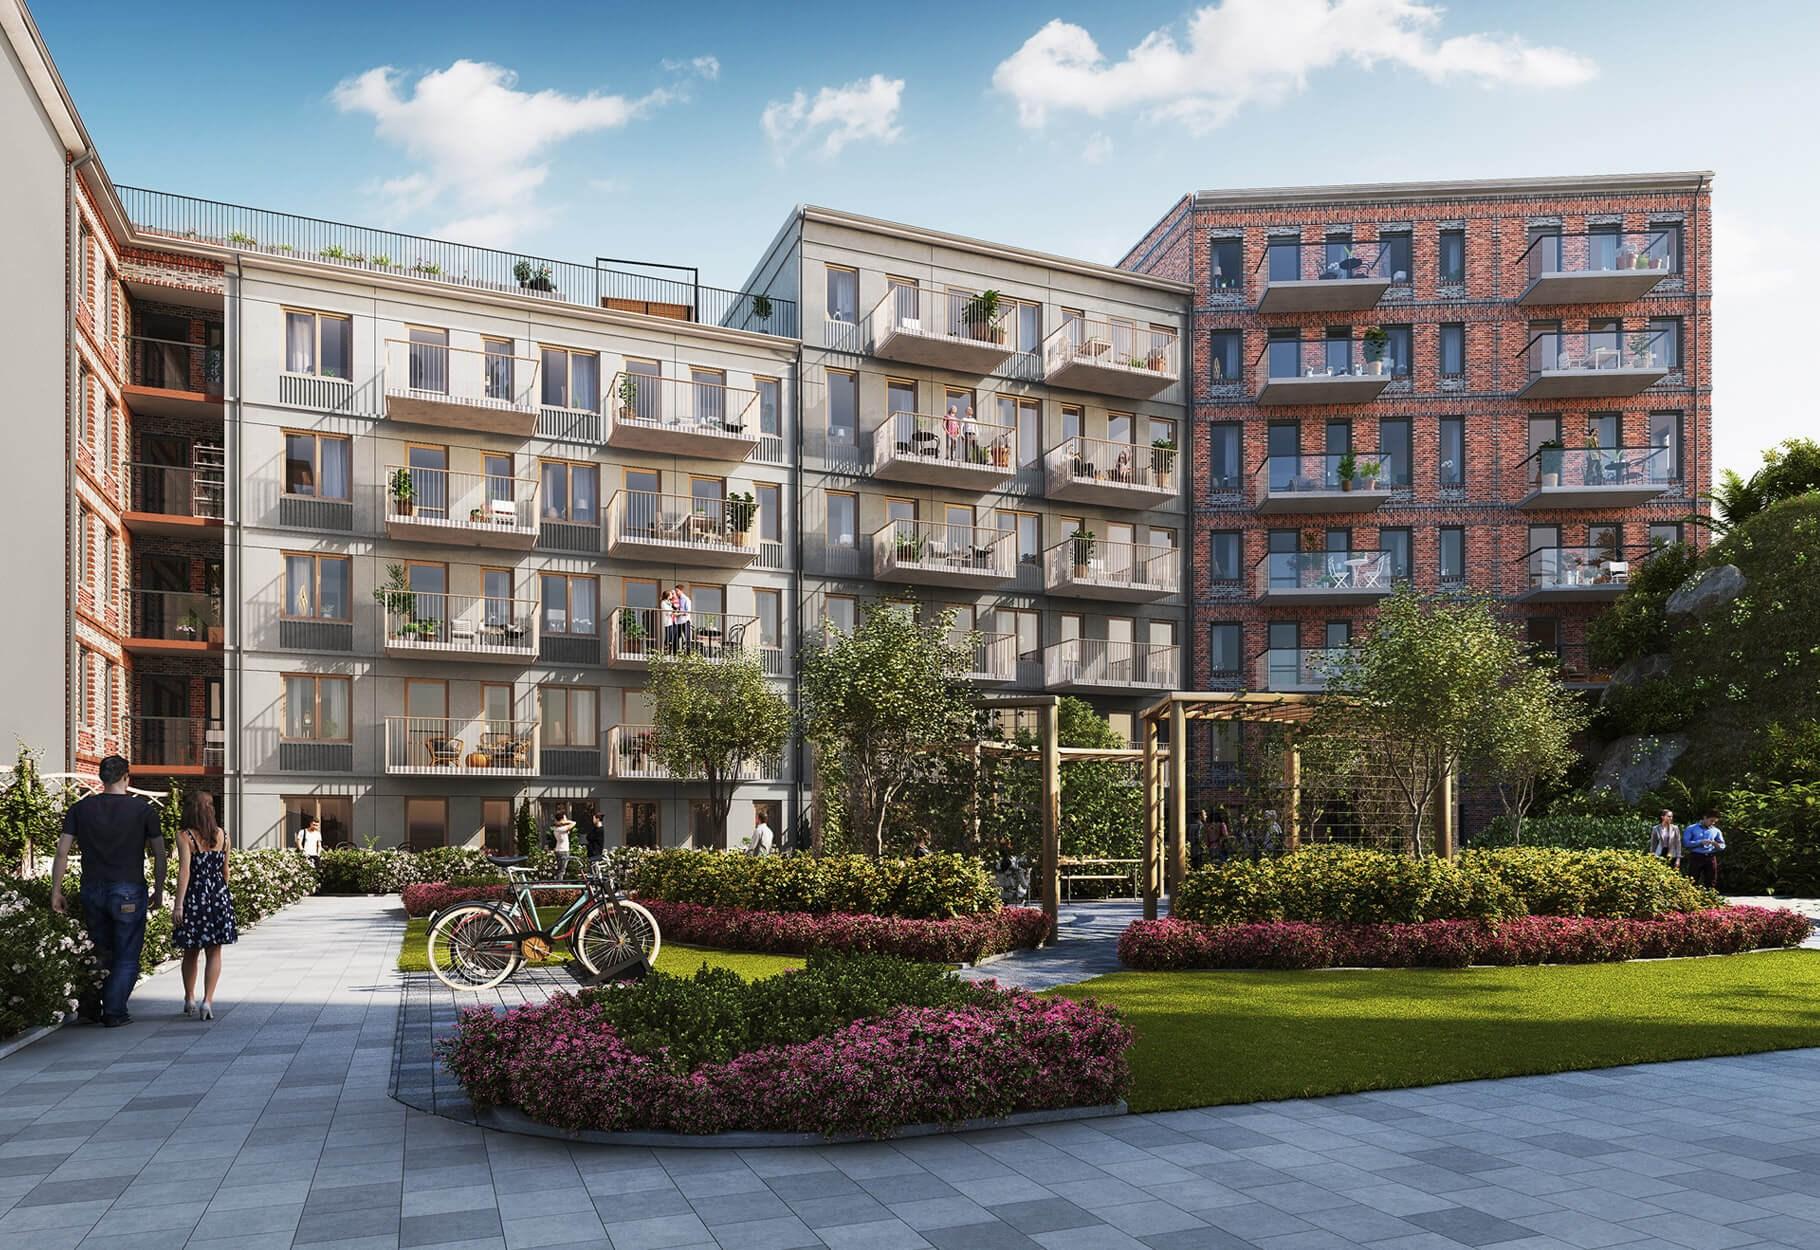 200 nya bostäder